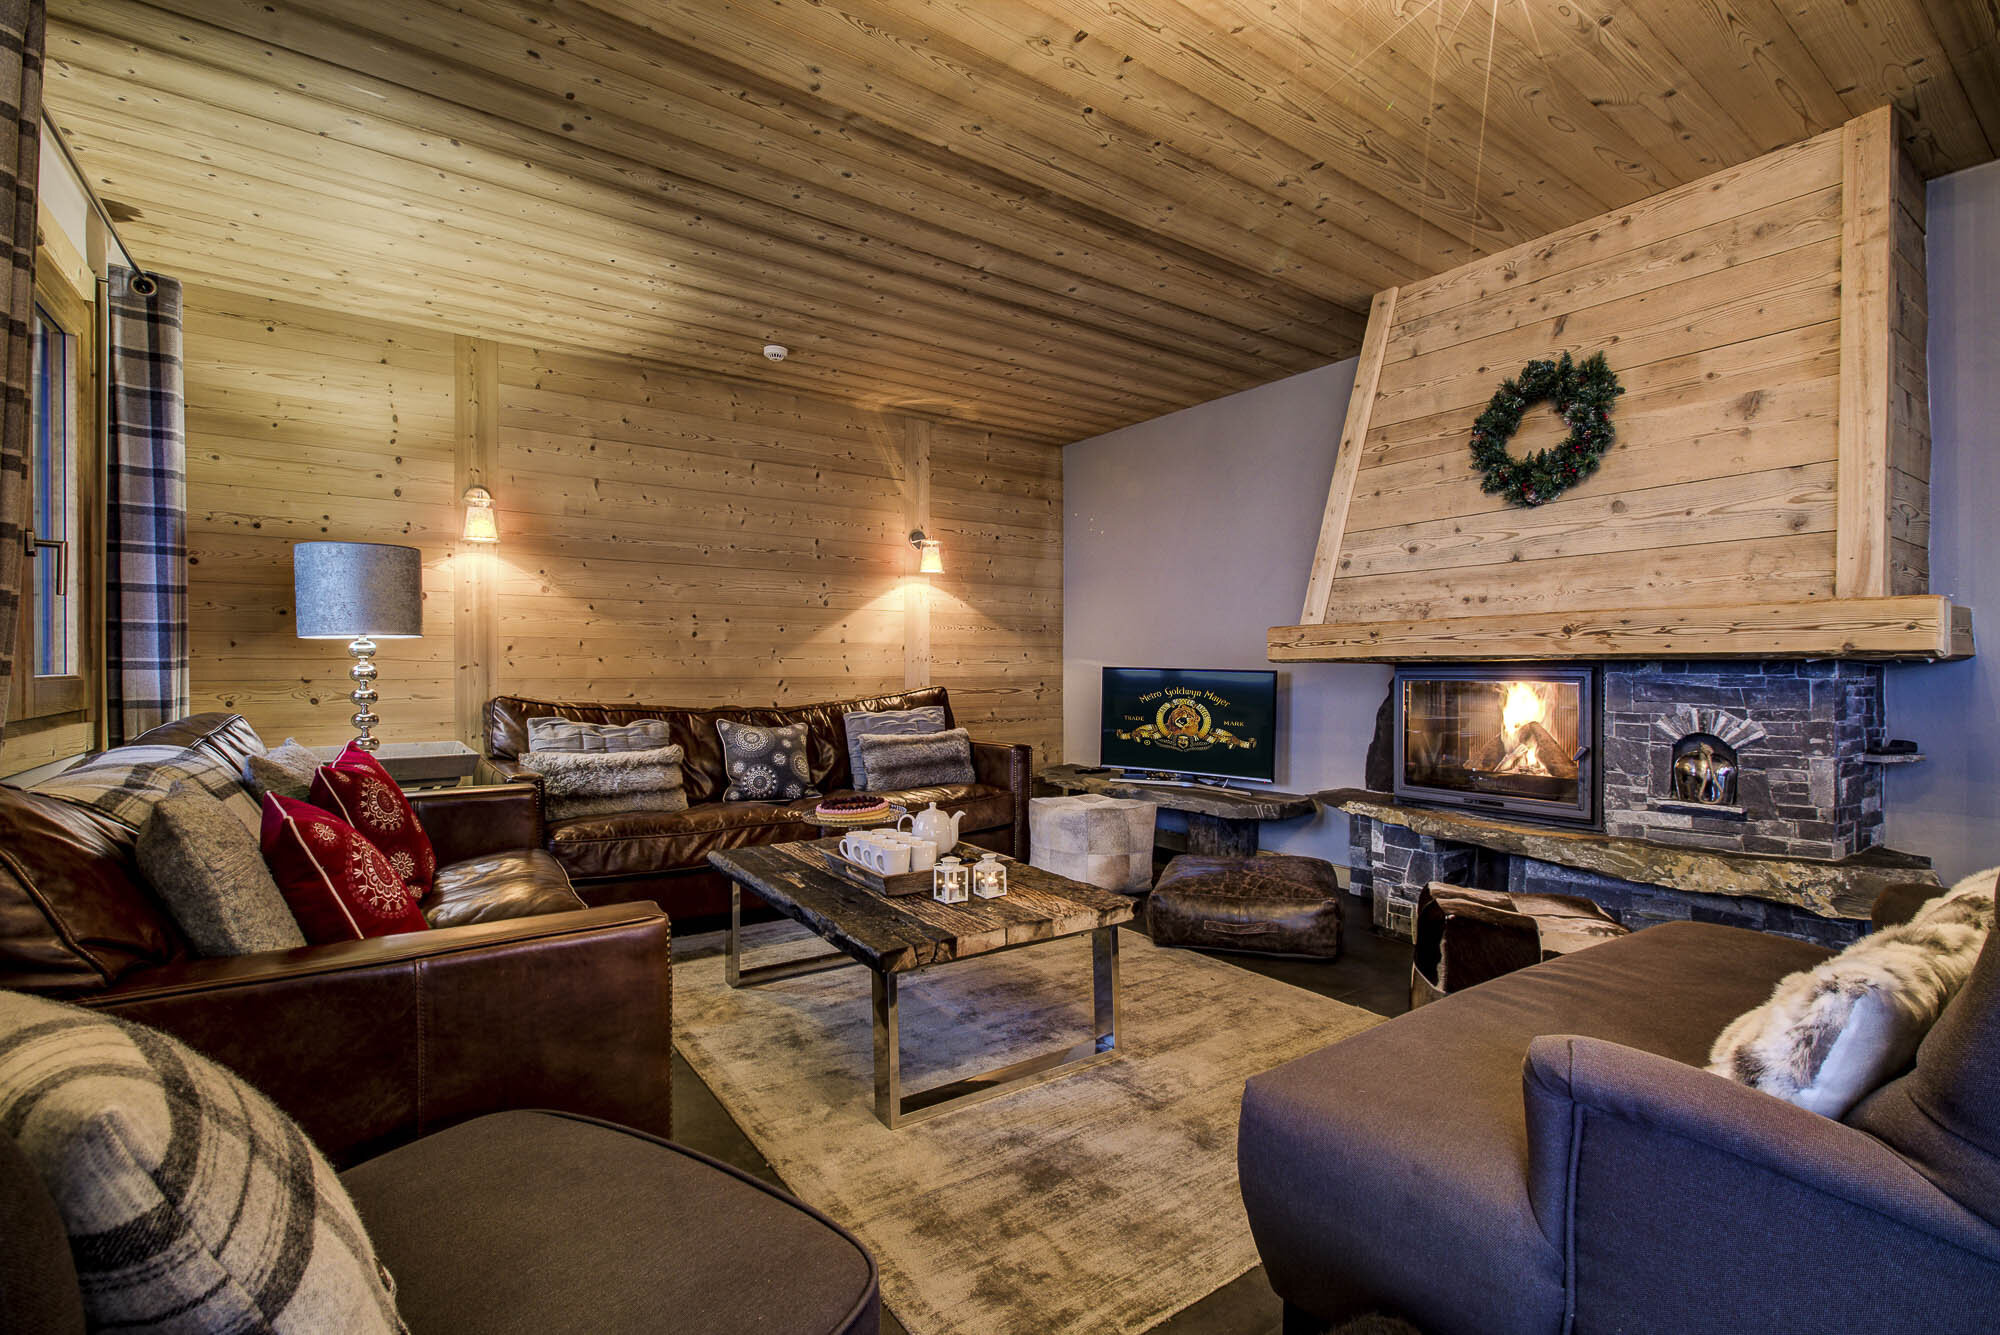 tg-ski-luxury-chalet-les-pierrys-morzine-016.jpg